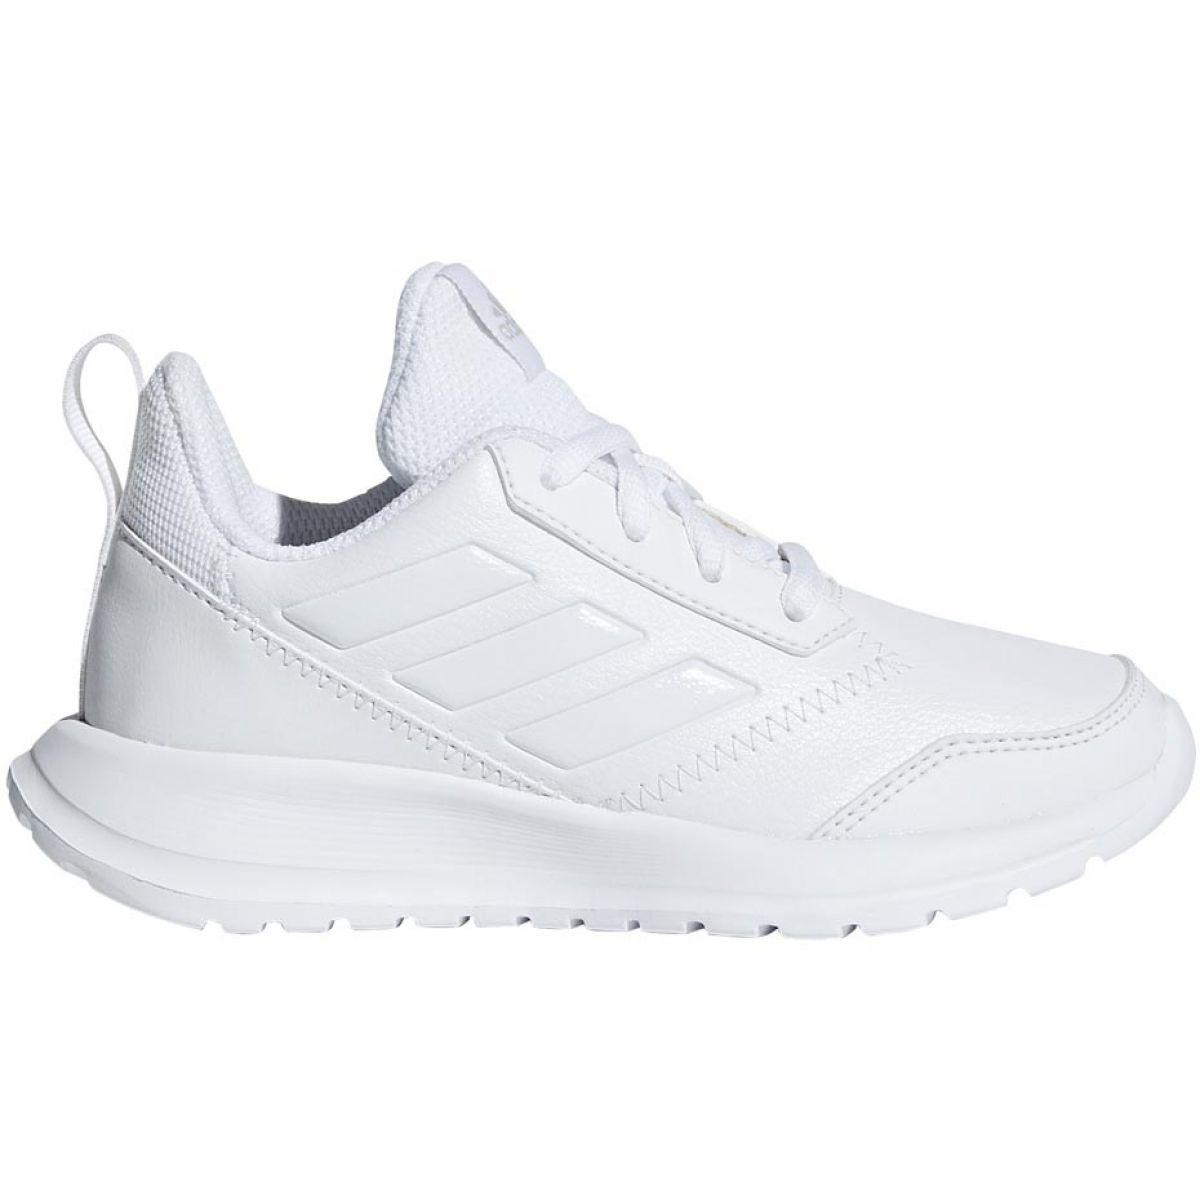 Buty adidas AltaRun K Jr CM8578 białe